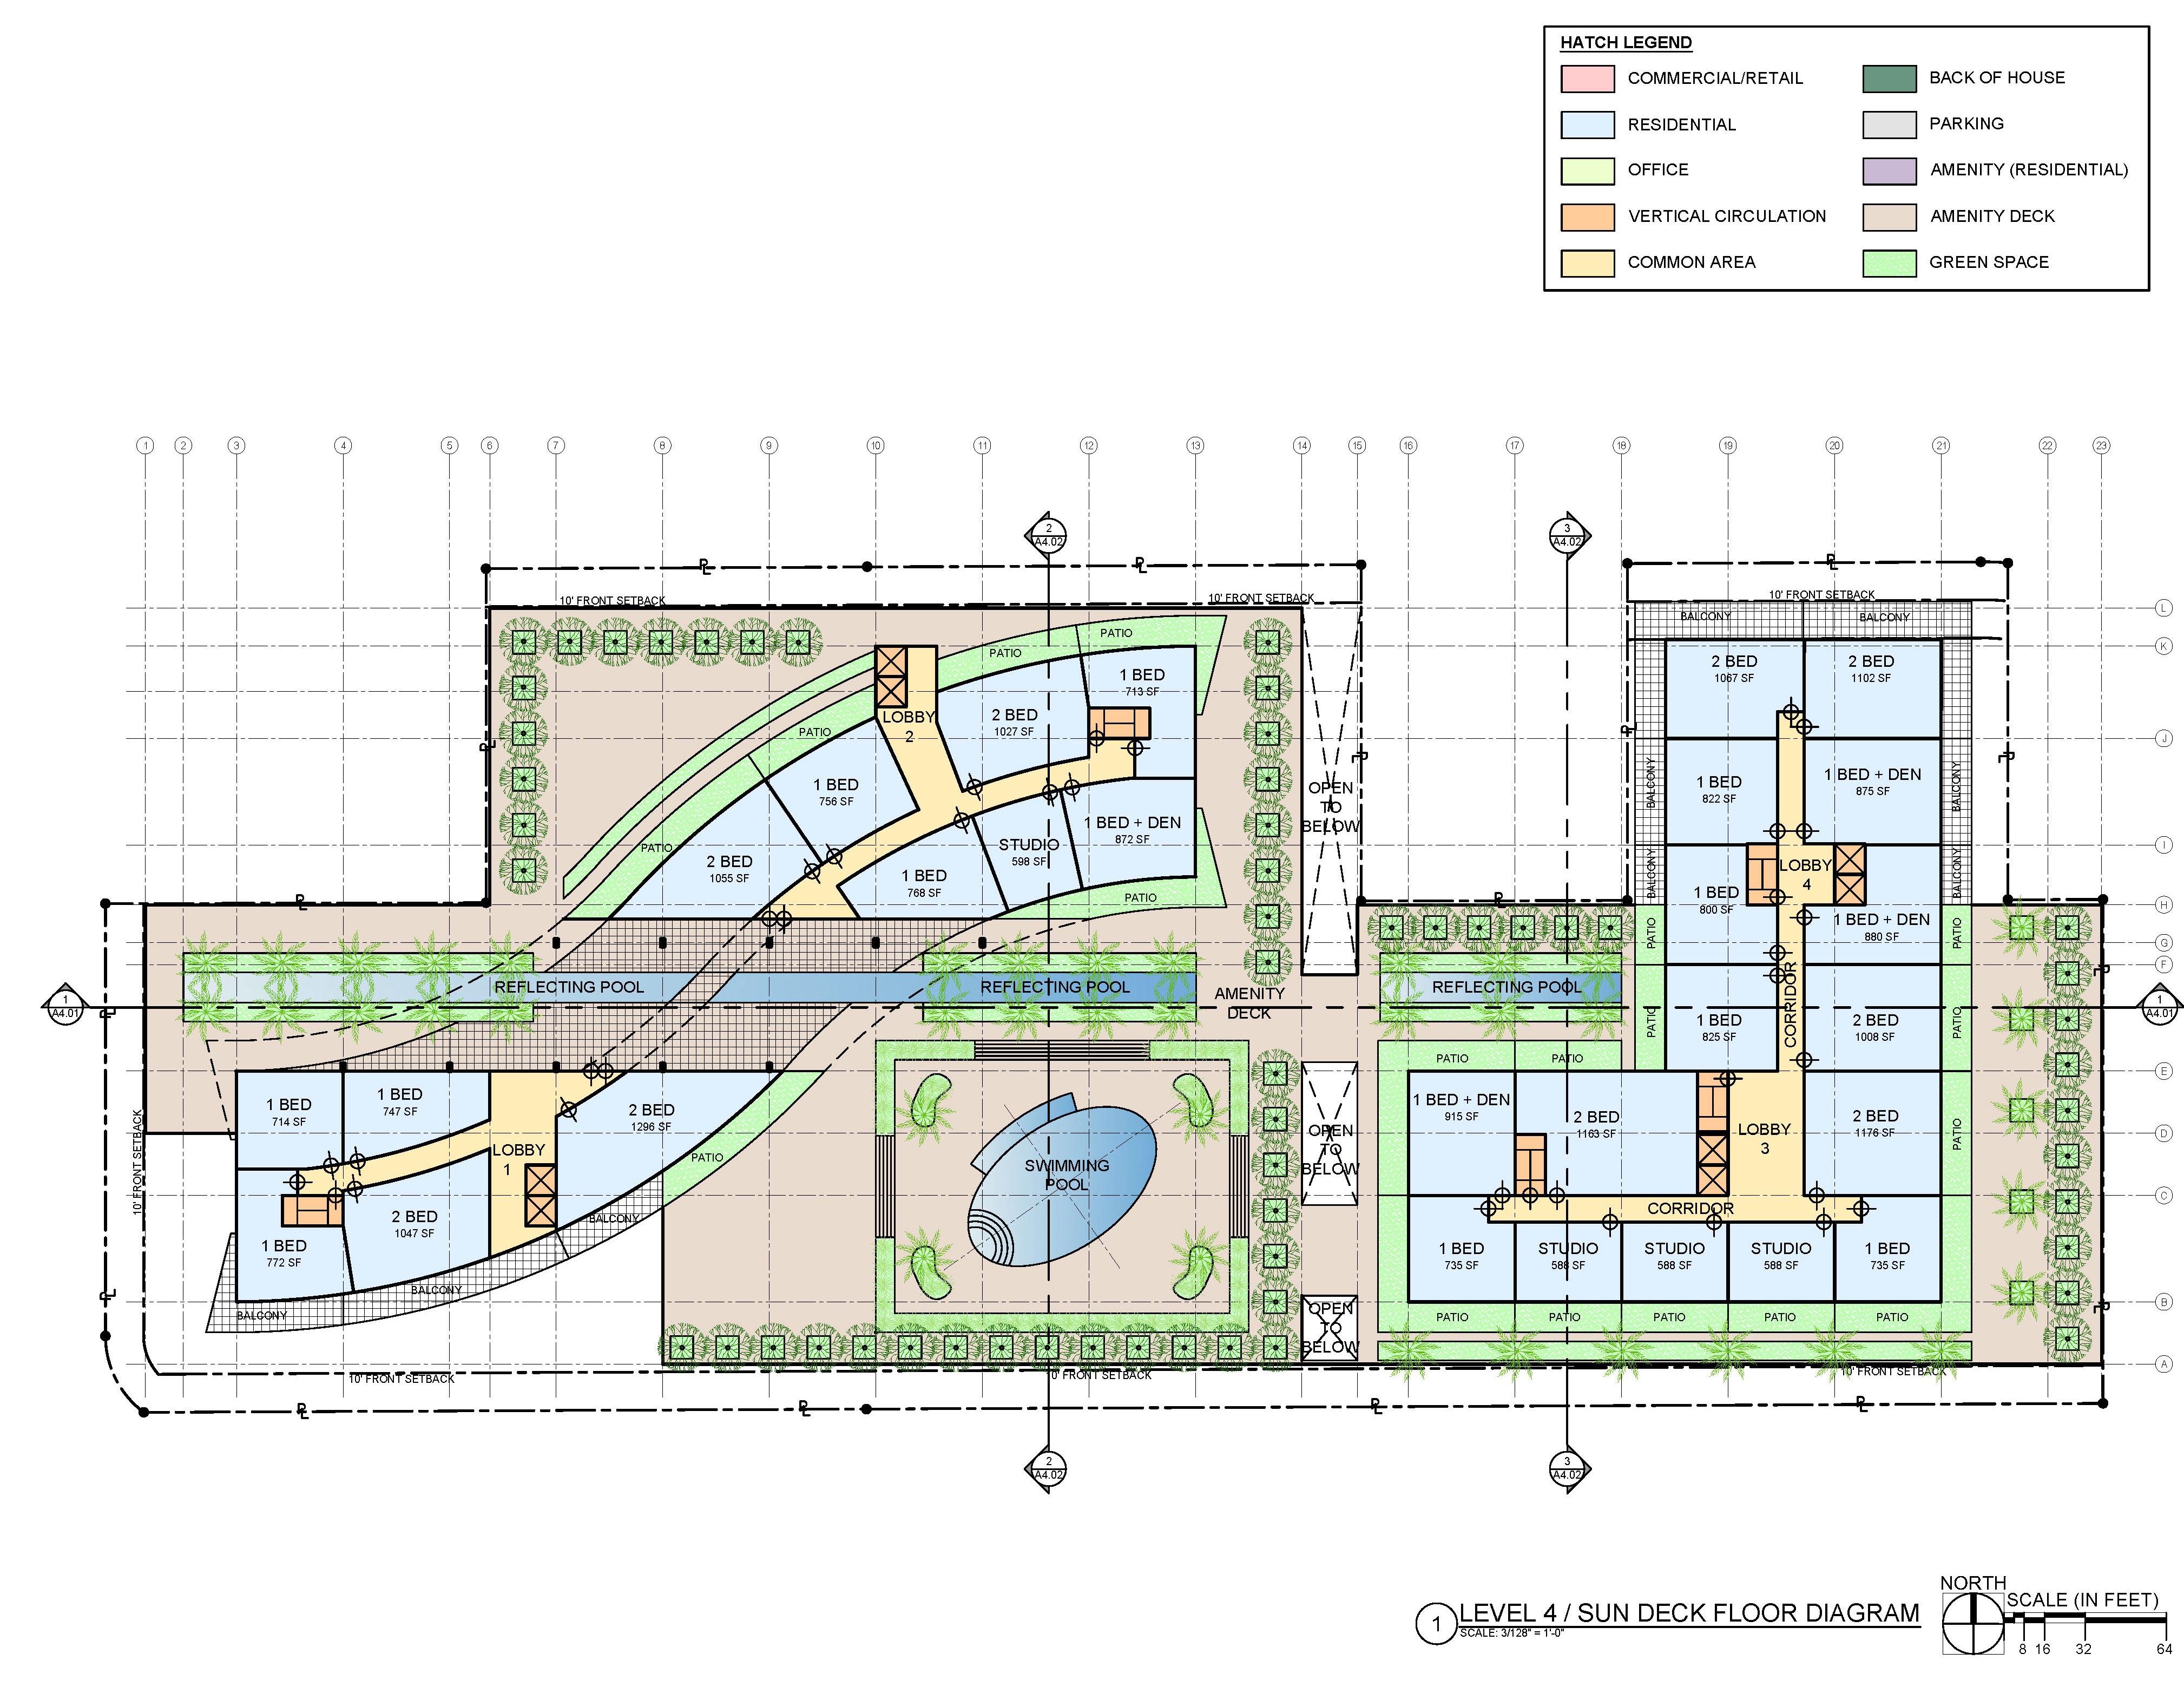 Level 4. Sun deck floor diagram